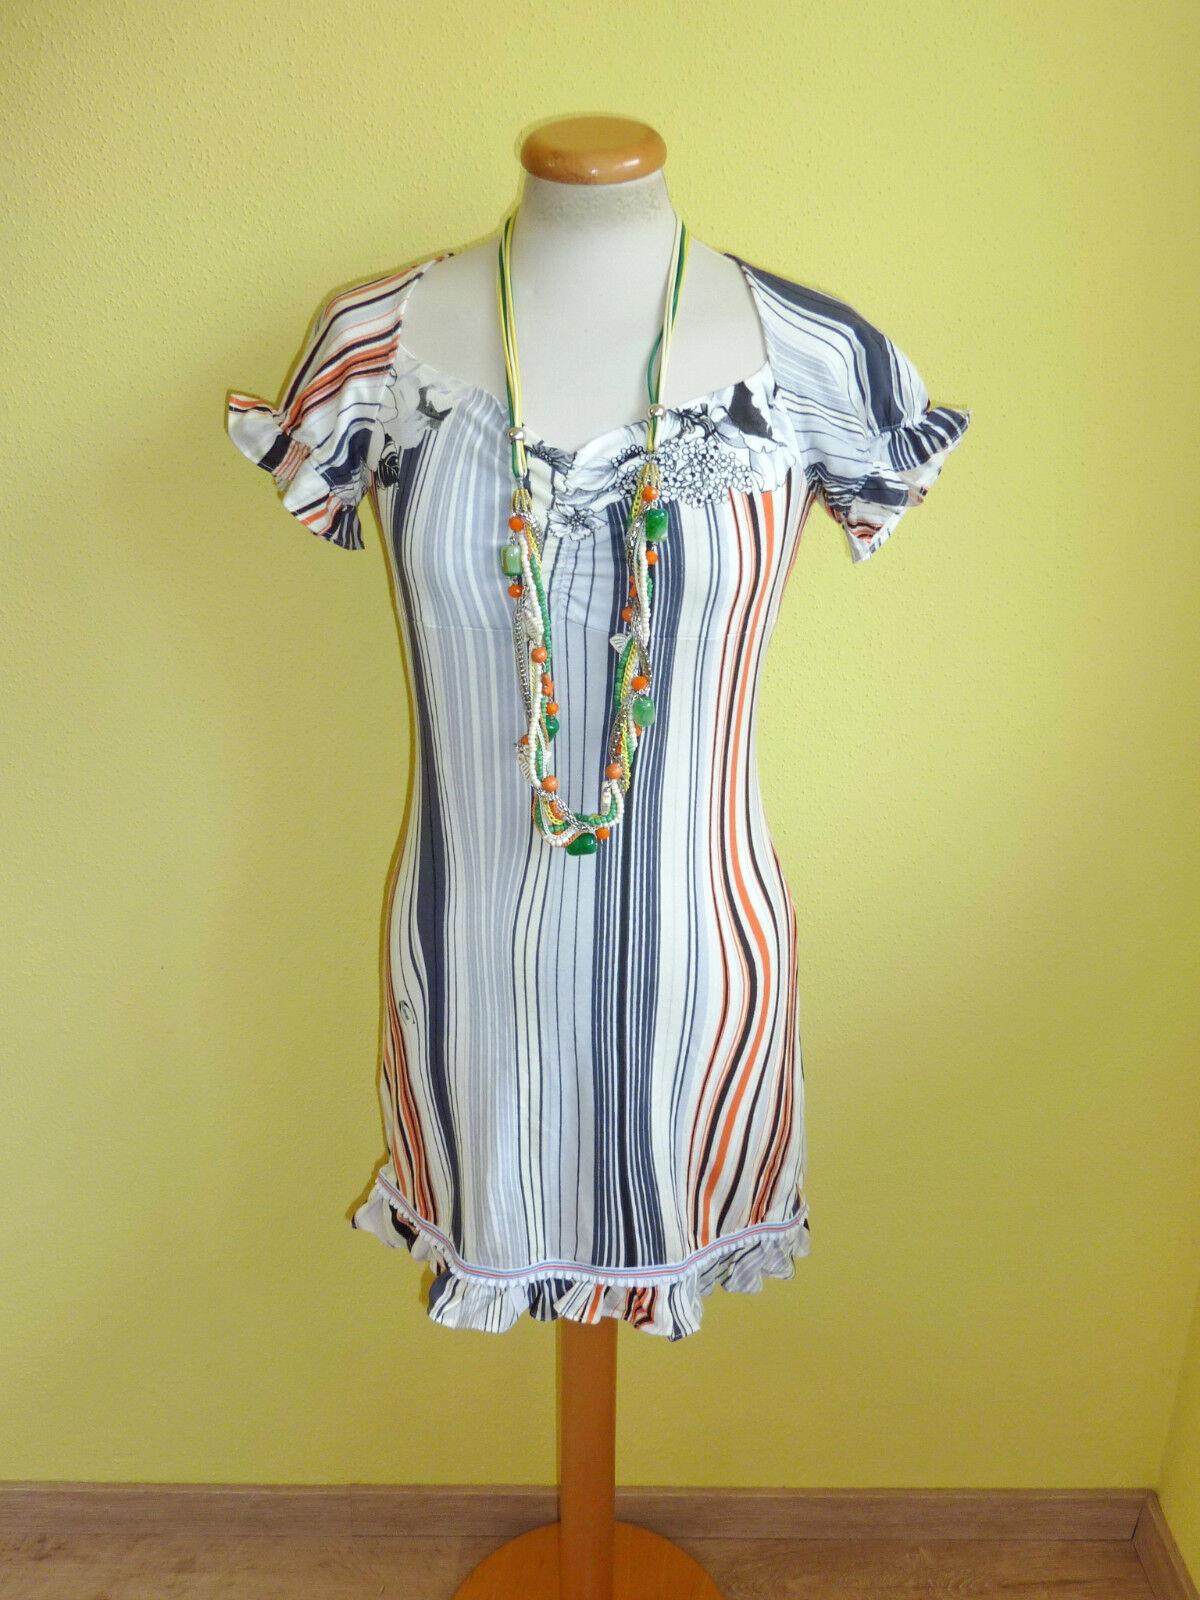 Kleid just Roberto Cavalli Shirtkleid original neu